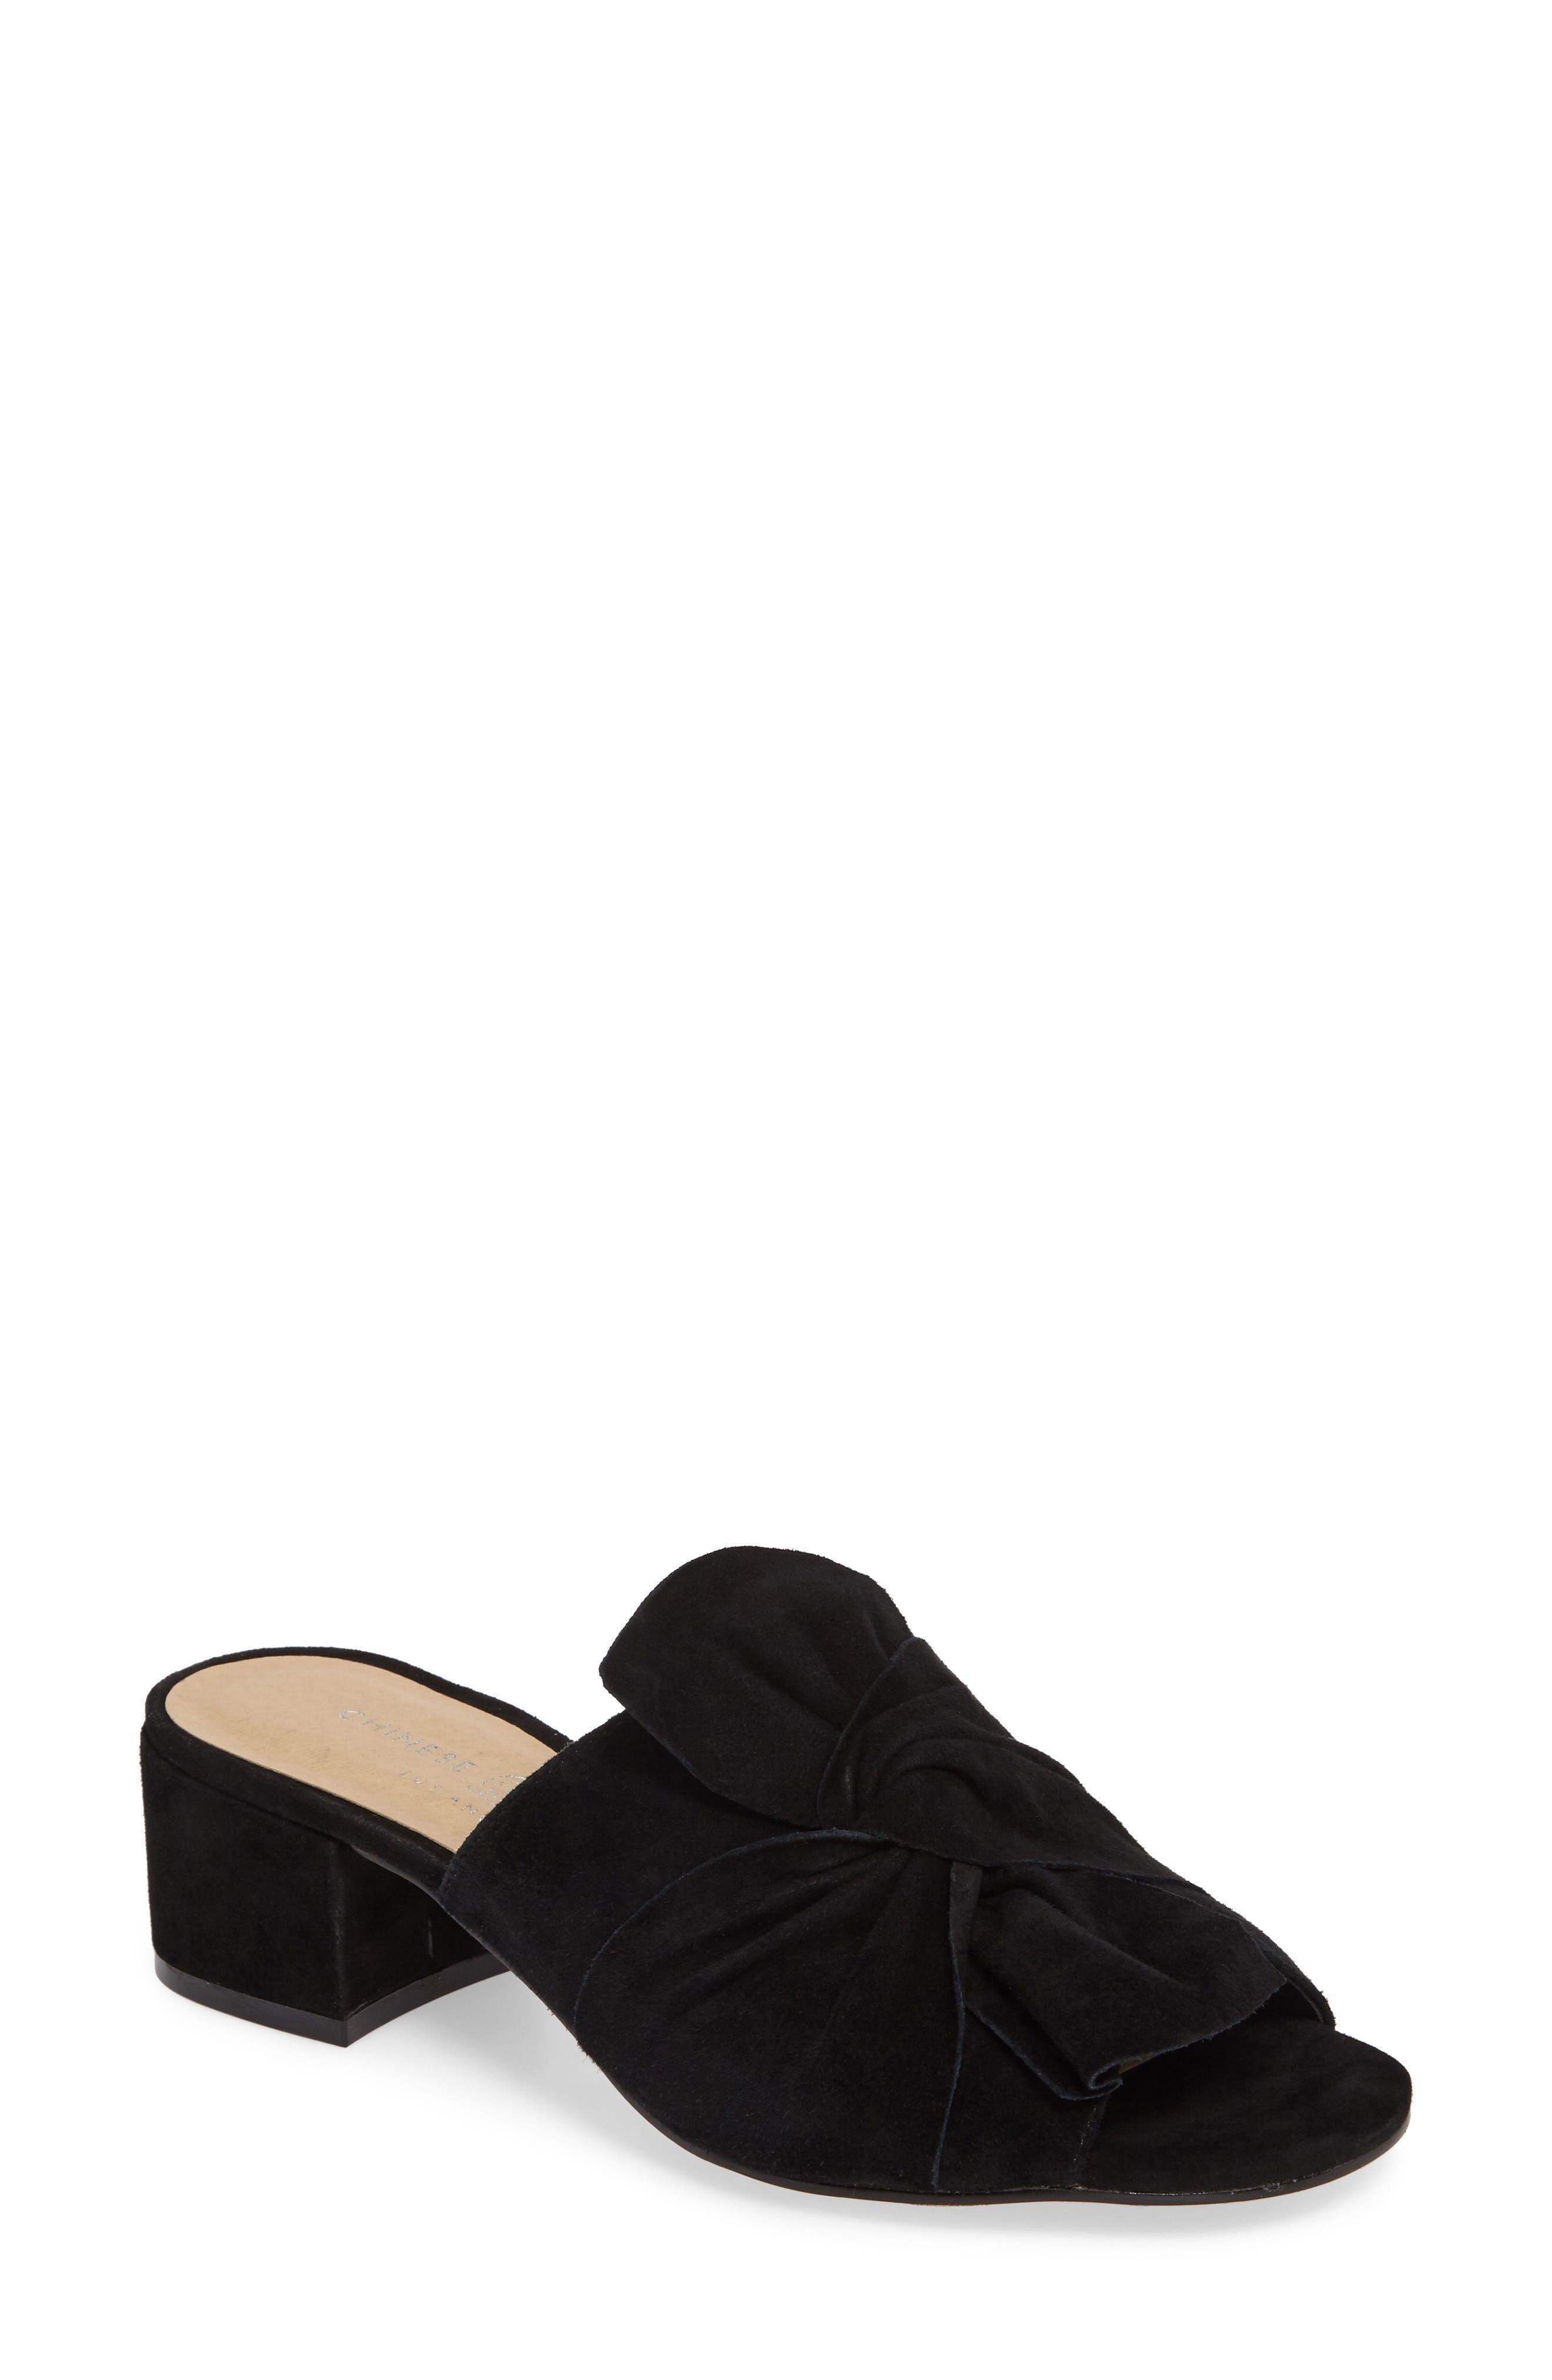 Marlowe Slide Sandal,                         Main,                         color, 001